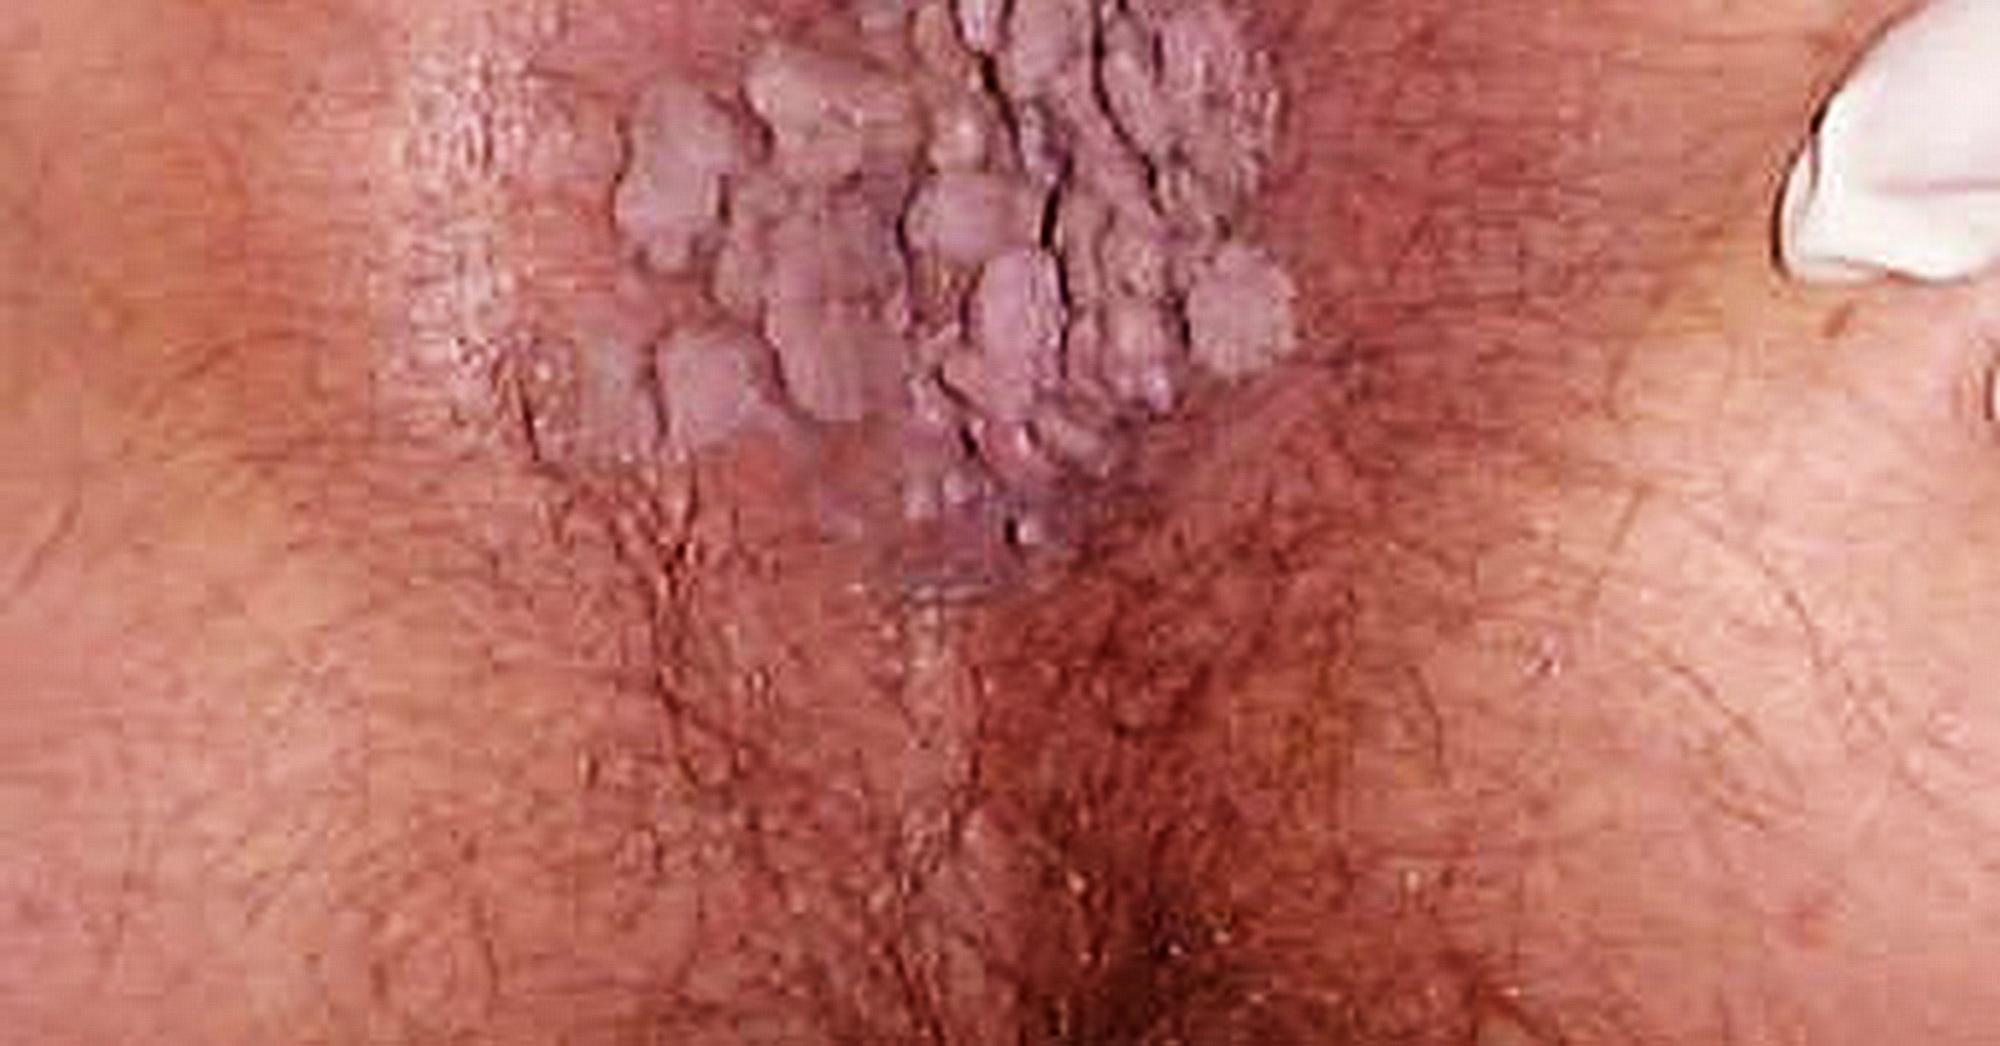 neuroendocrine cancer with bone metastases schistosomiasis zambezi